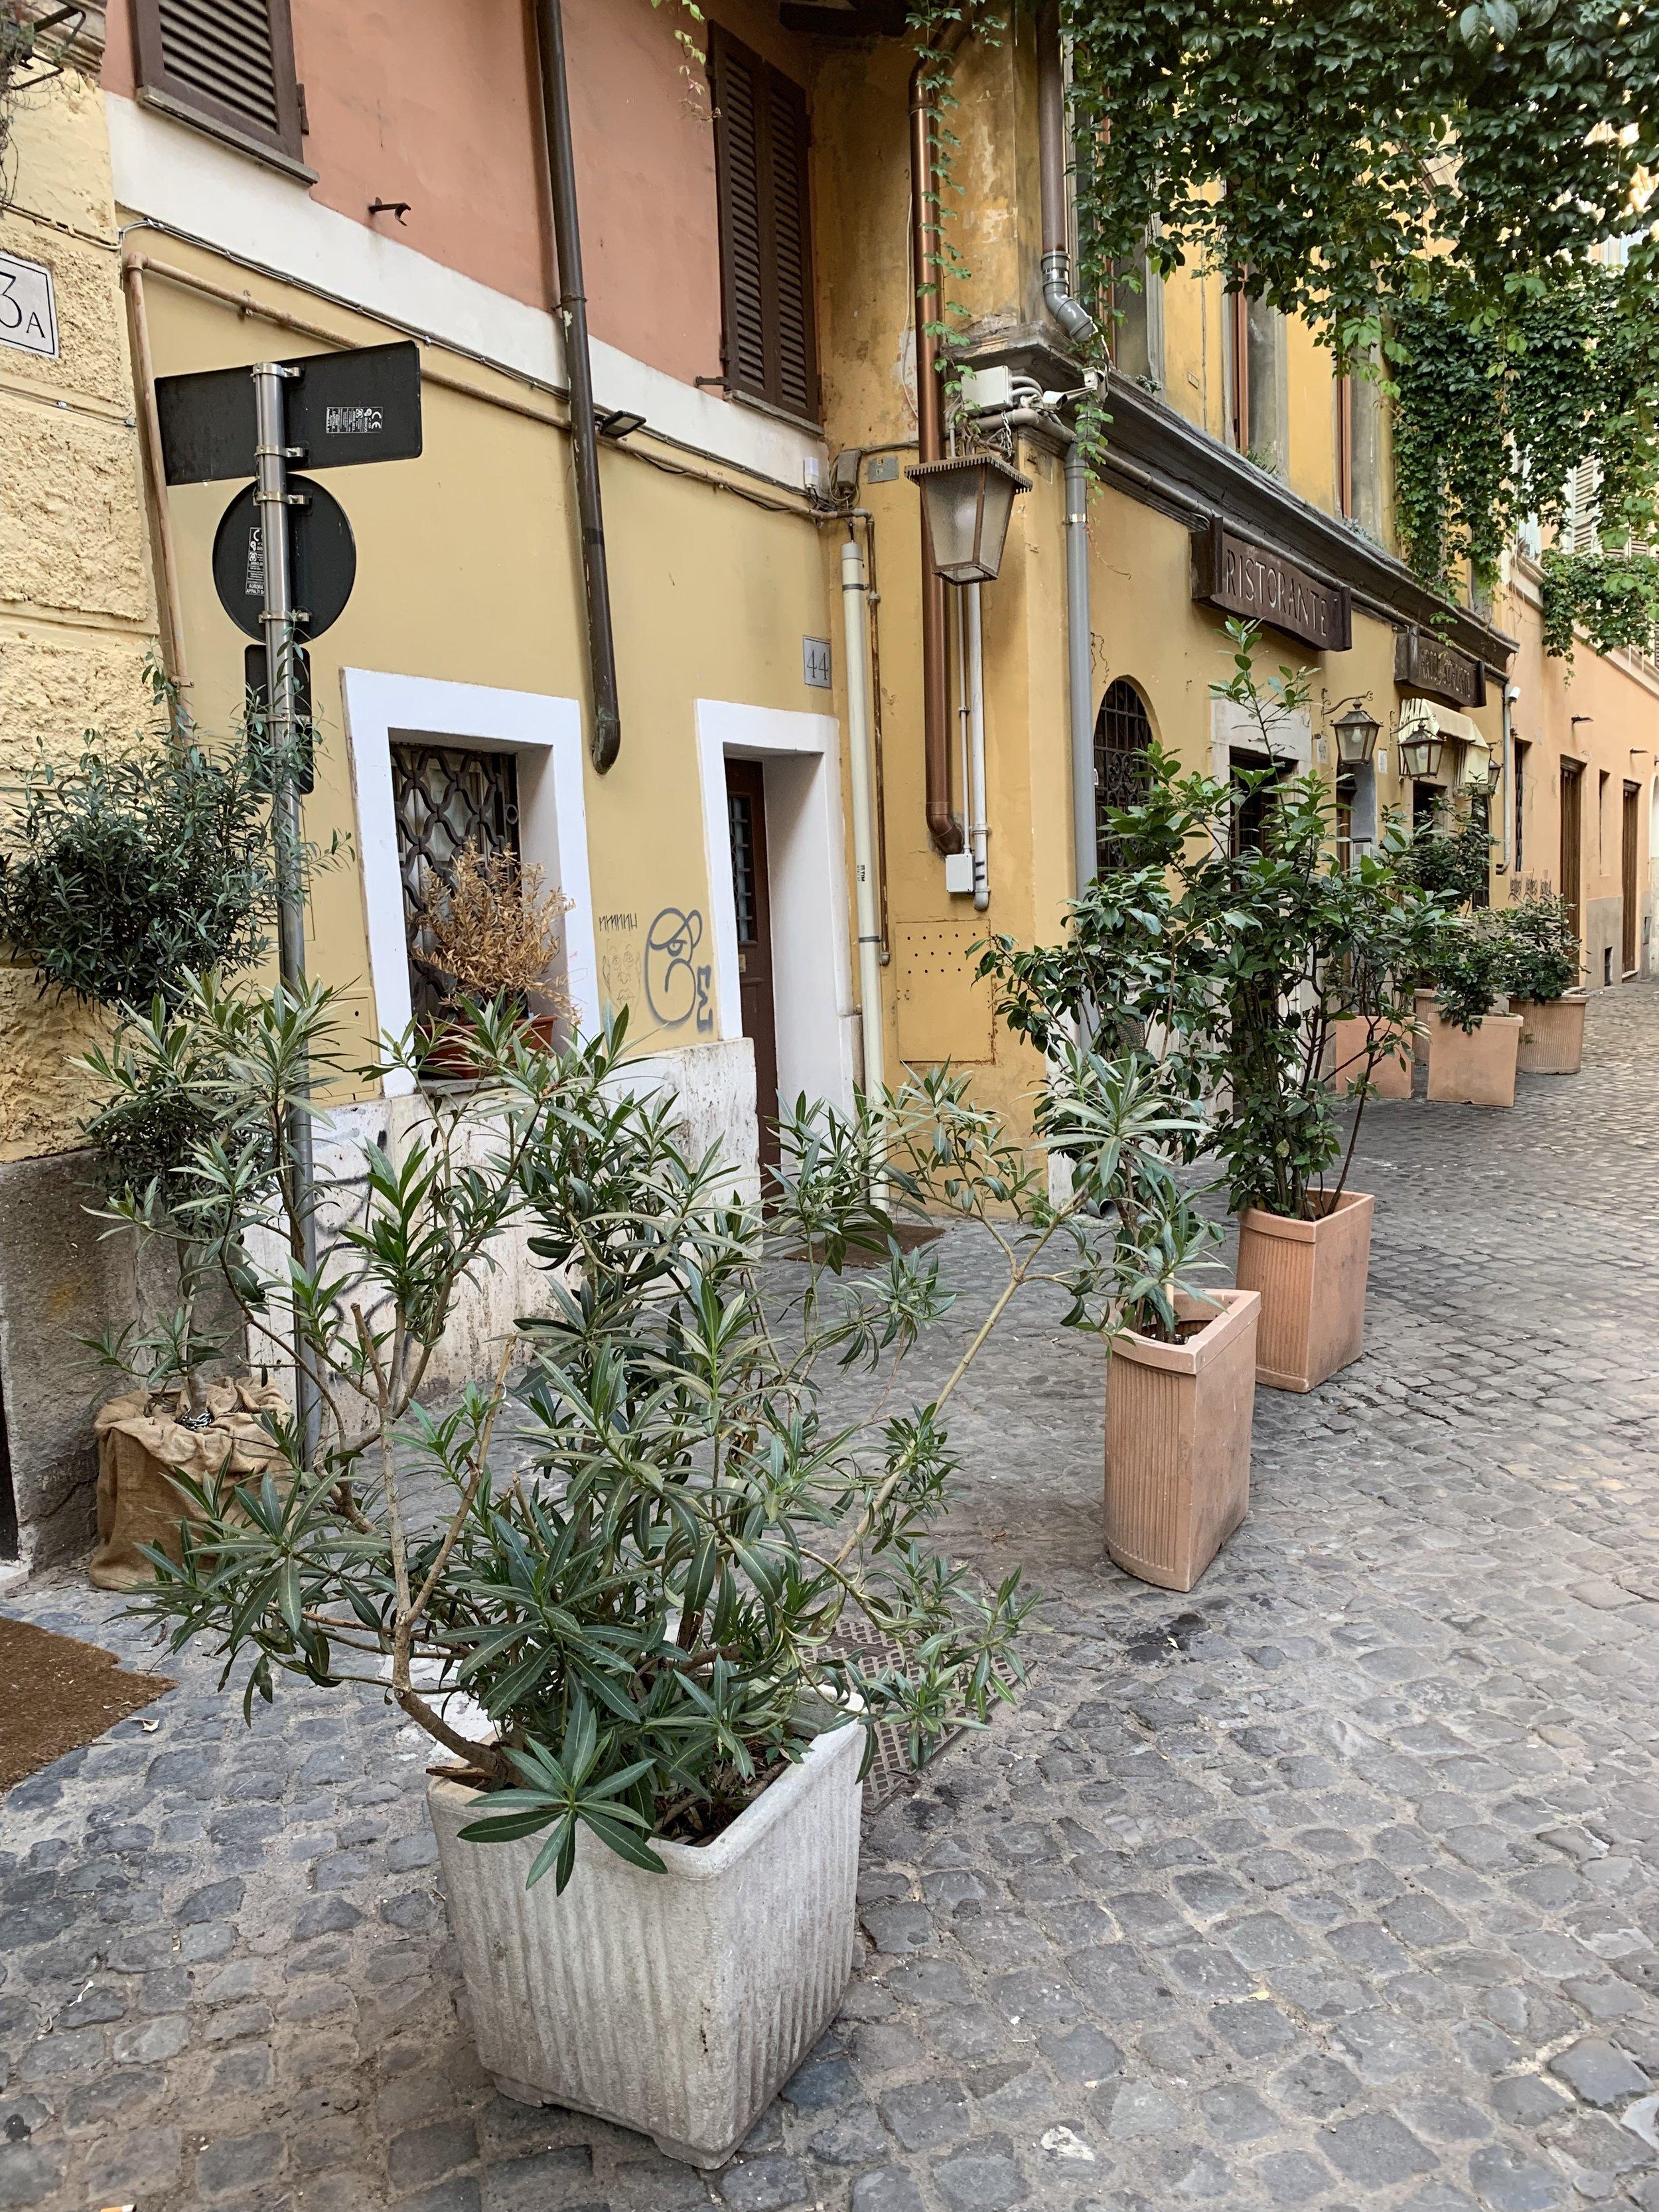 Rome Italy photography, Rome travel guide, Rome travel diary, Sorrento Italy photography, Sorrento Italy, travel Italy photography, pantheon, colosseum, trevi fountain, da enzo